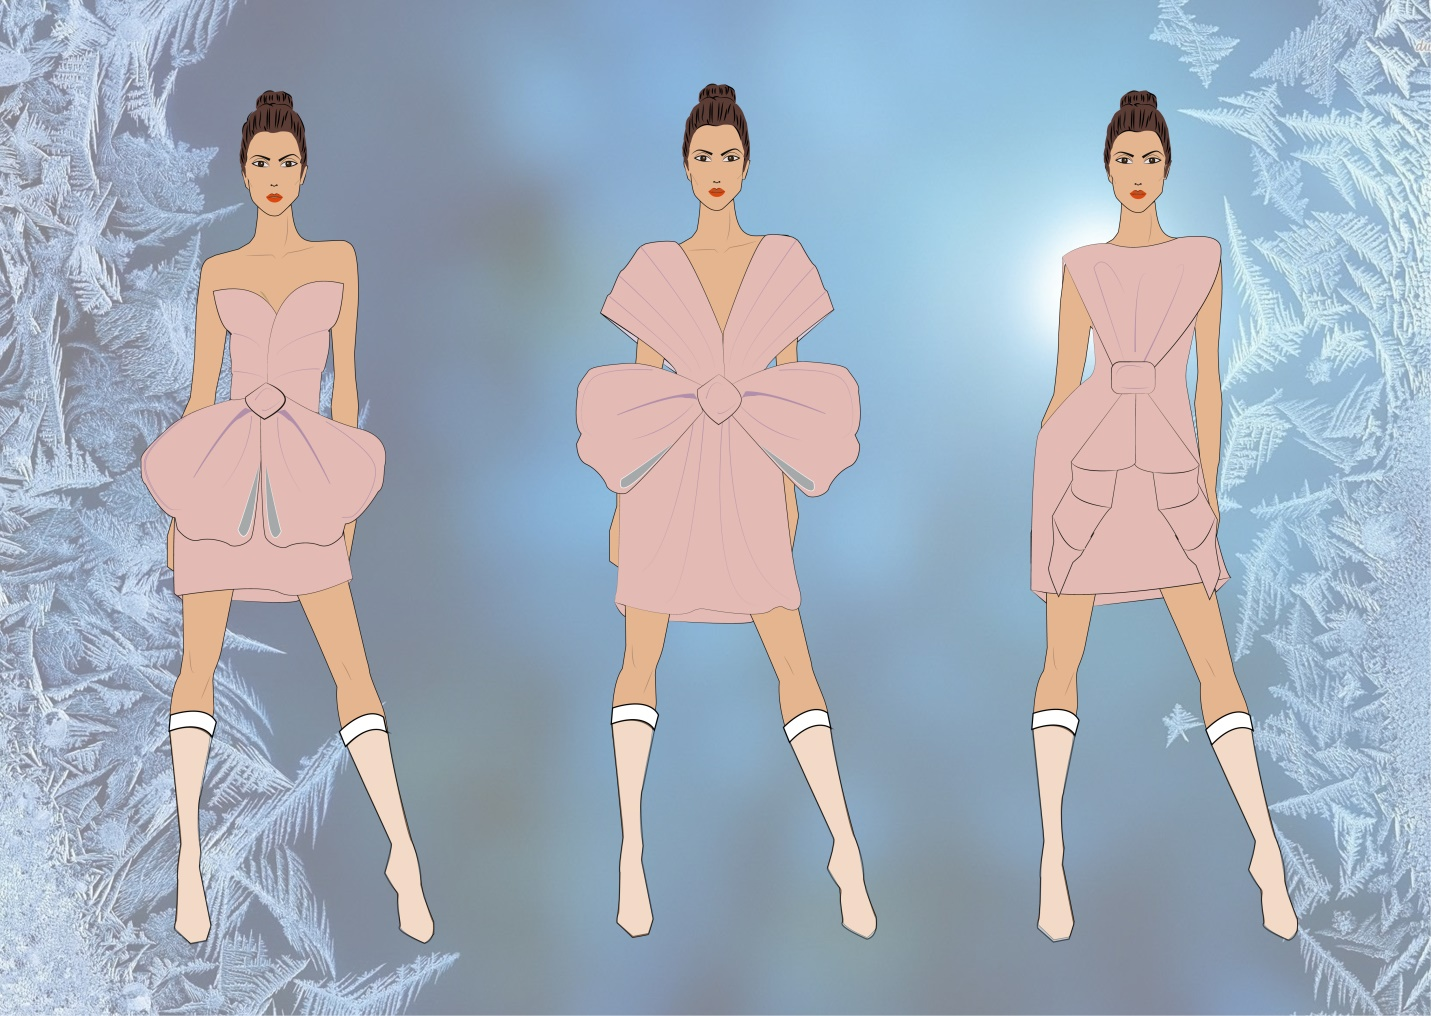 Quintessential Allure quintessential allure - QUINTESSENTIAL ALLURE   JD Annual Design Awards 2019 Fashion Design 6 - QUINTESSENTIAL ALLURE–JD Annual Design Awards 2019 | Fashion Design